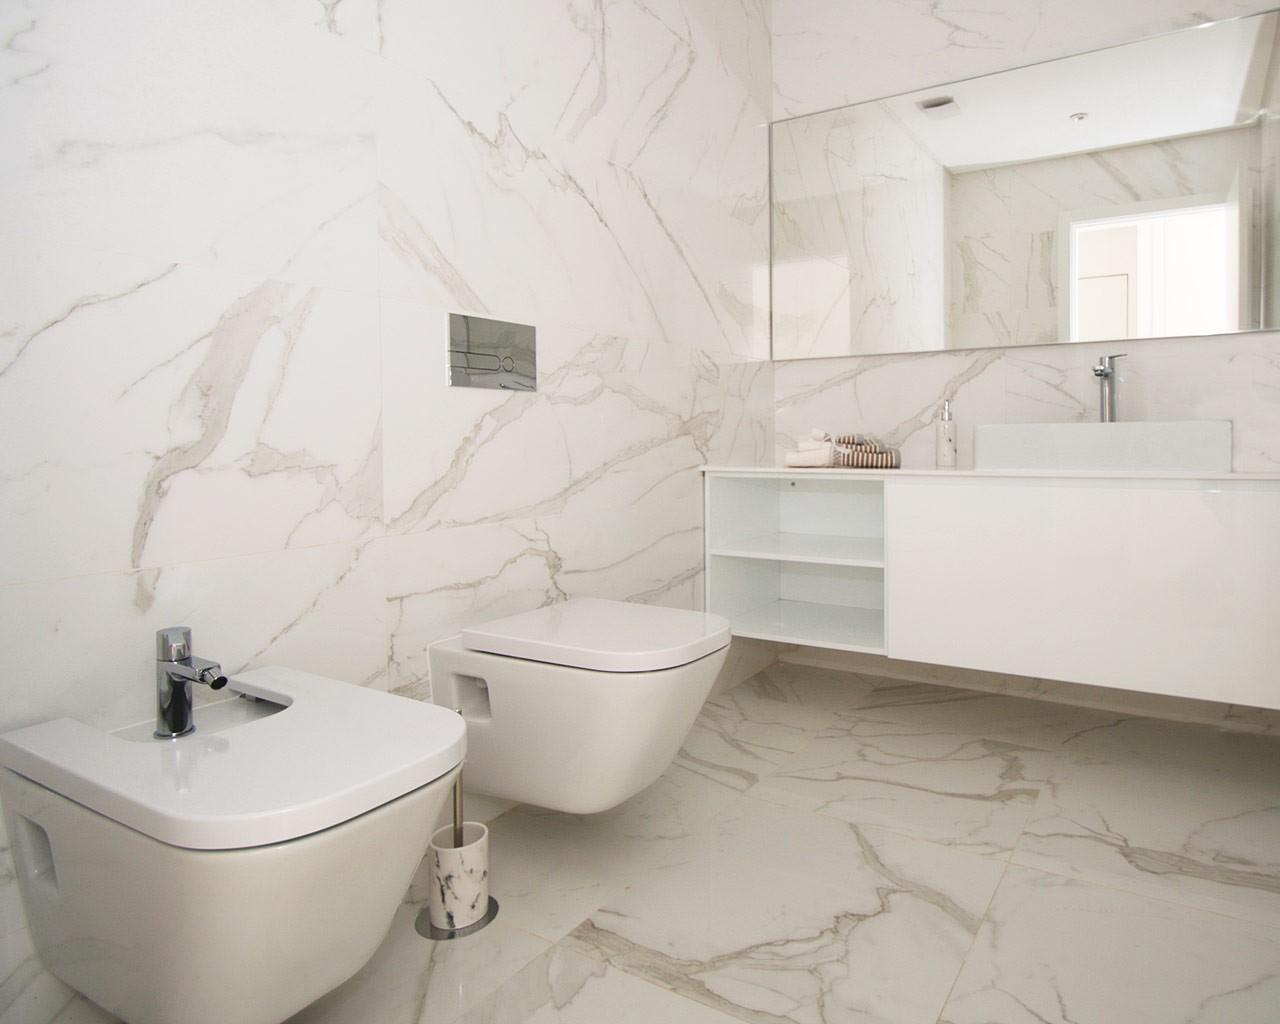 ferragudo-design-villas-salle-bains